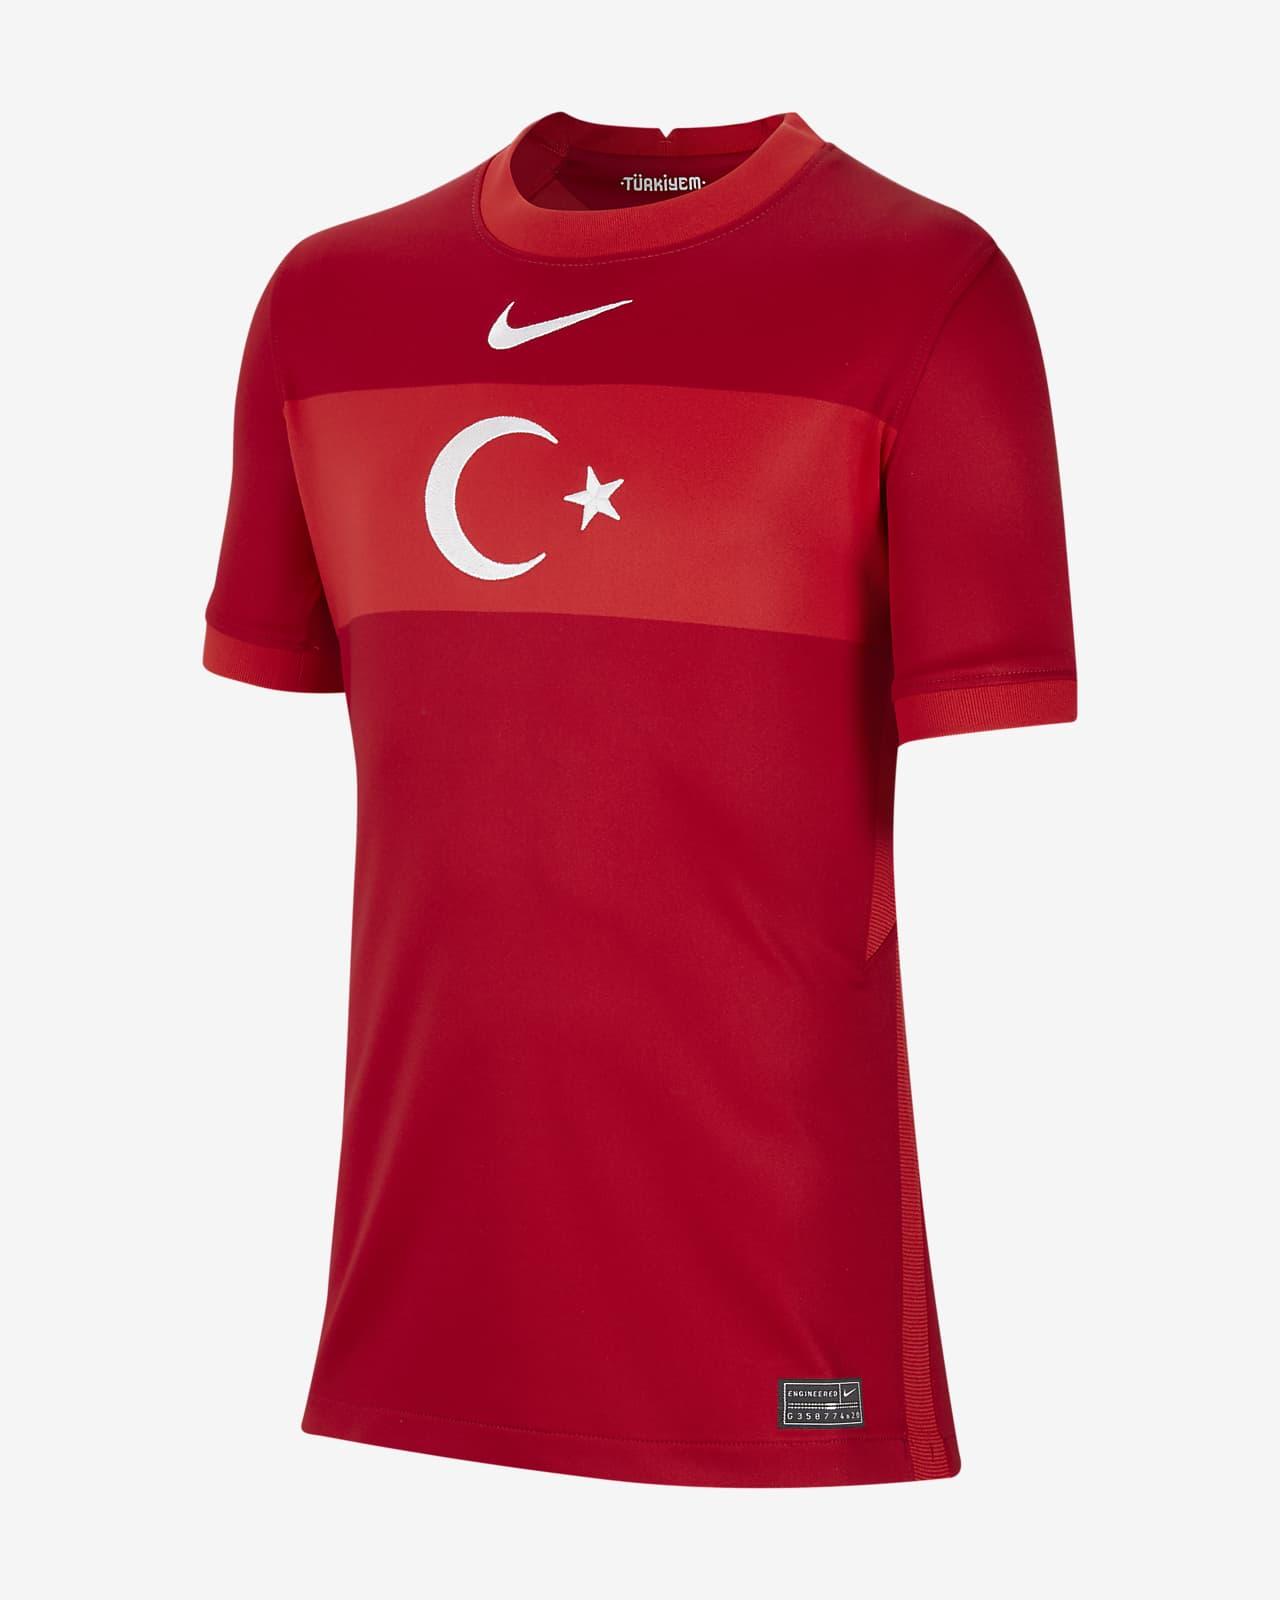 Turkey 2020 Stadium Away Older Kids' Football Shirt